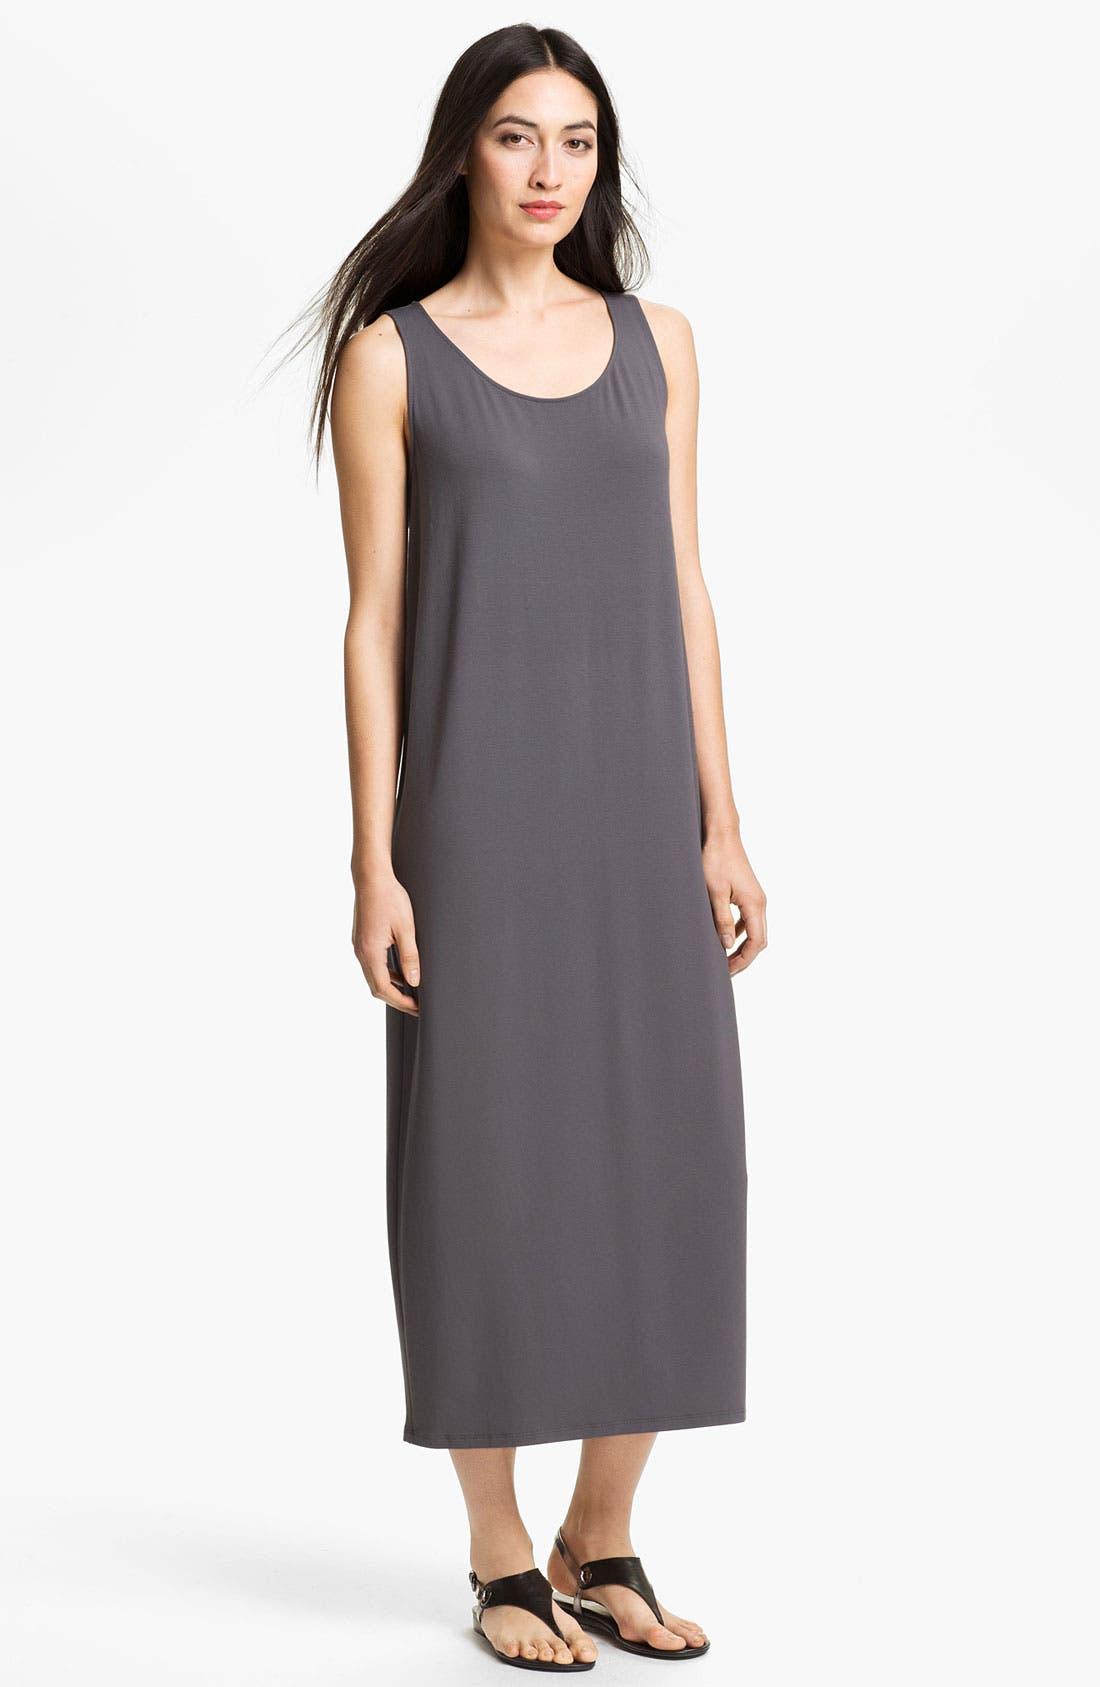 Alternate Image 1 Selected - Eileen Fisher Scoop Neck Sleeveless Dress